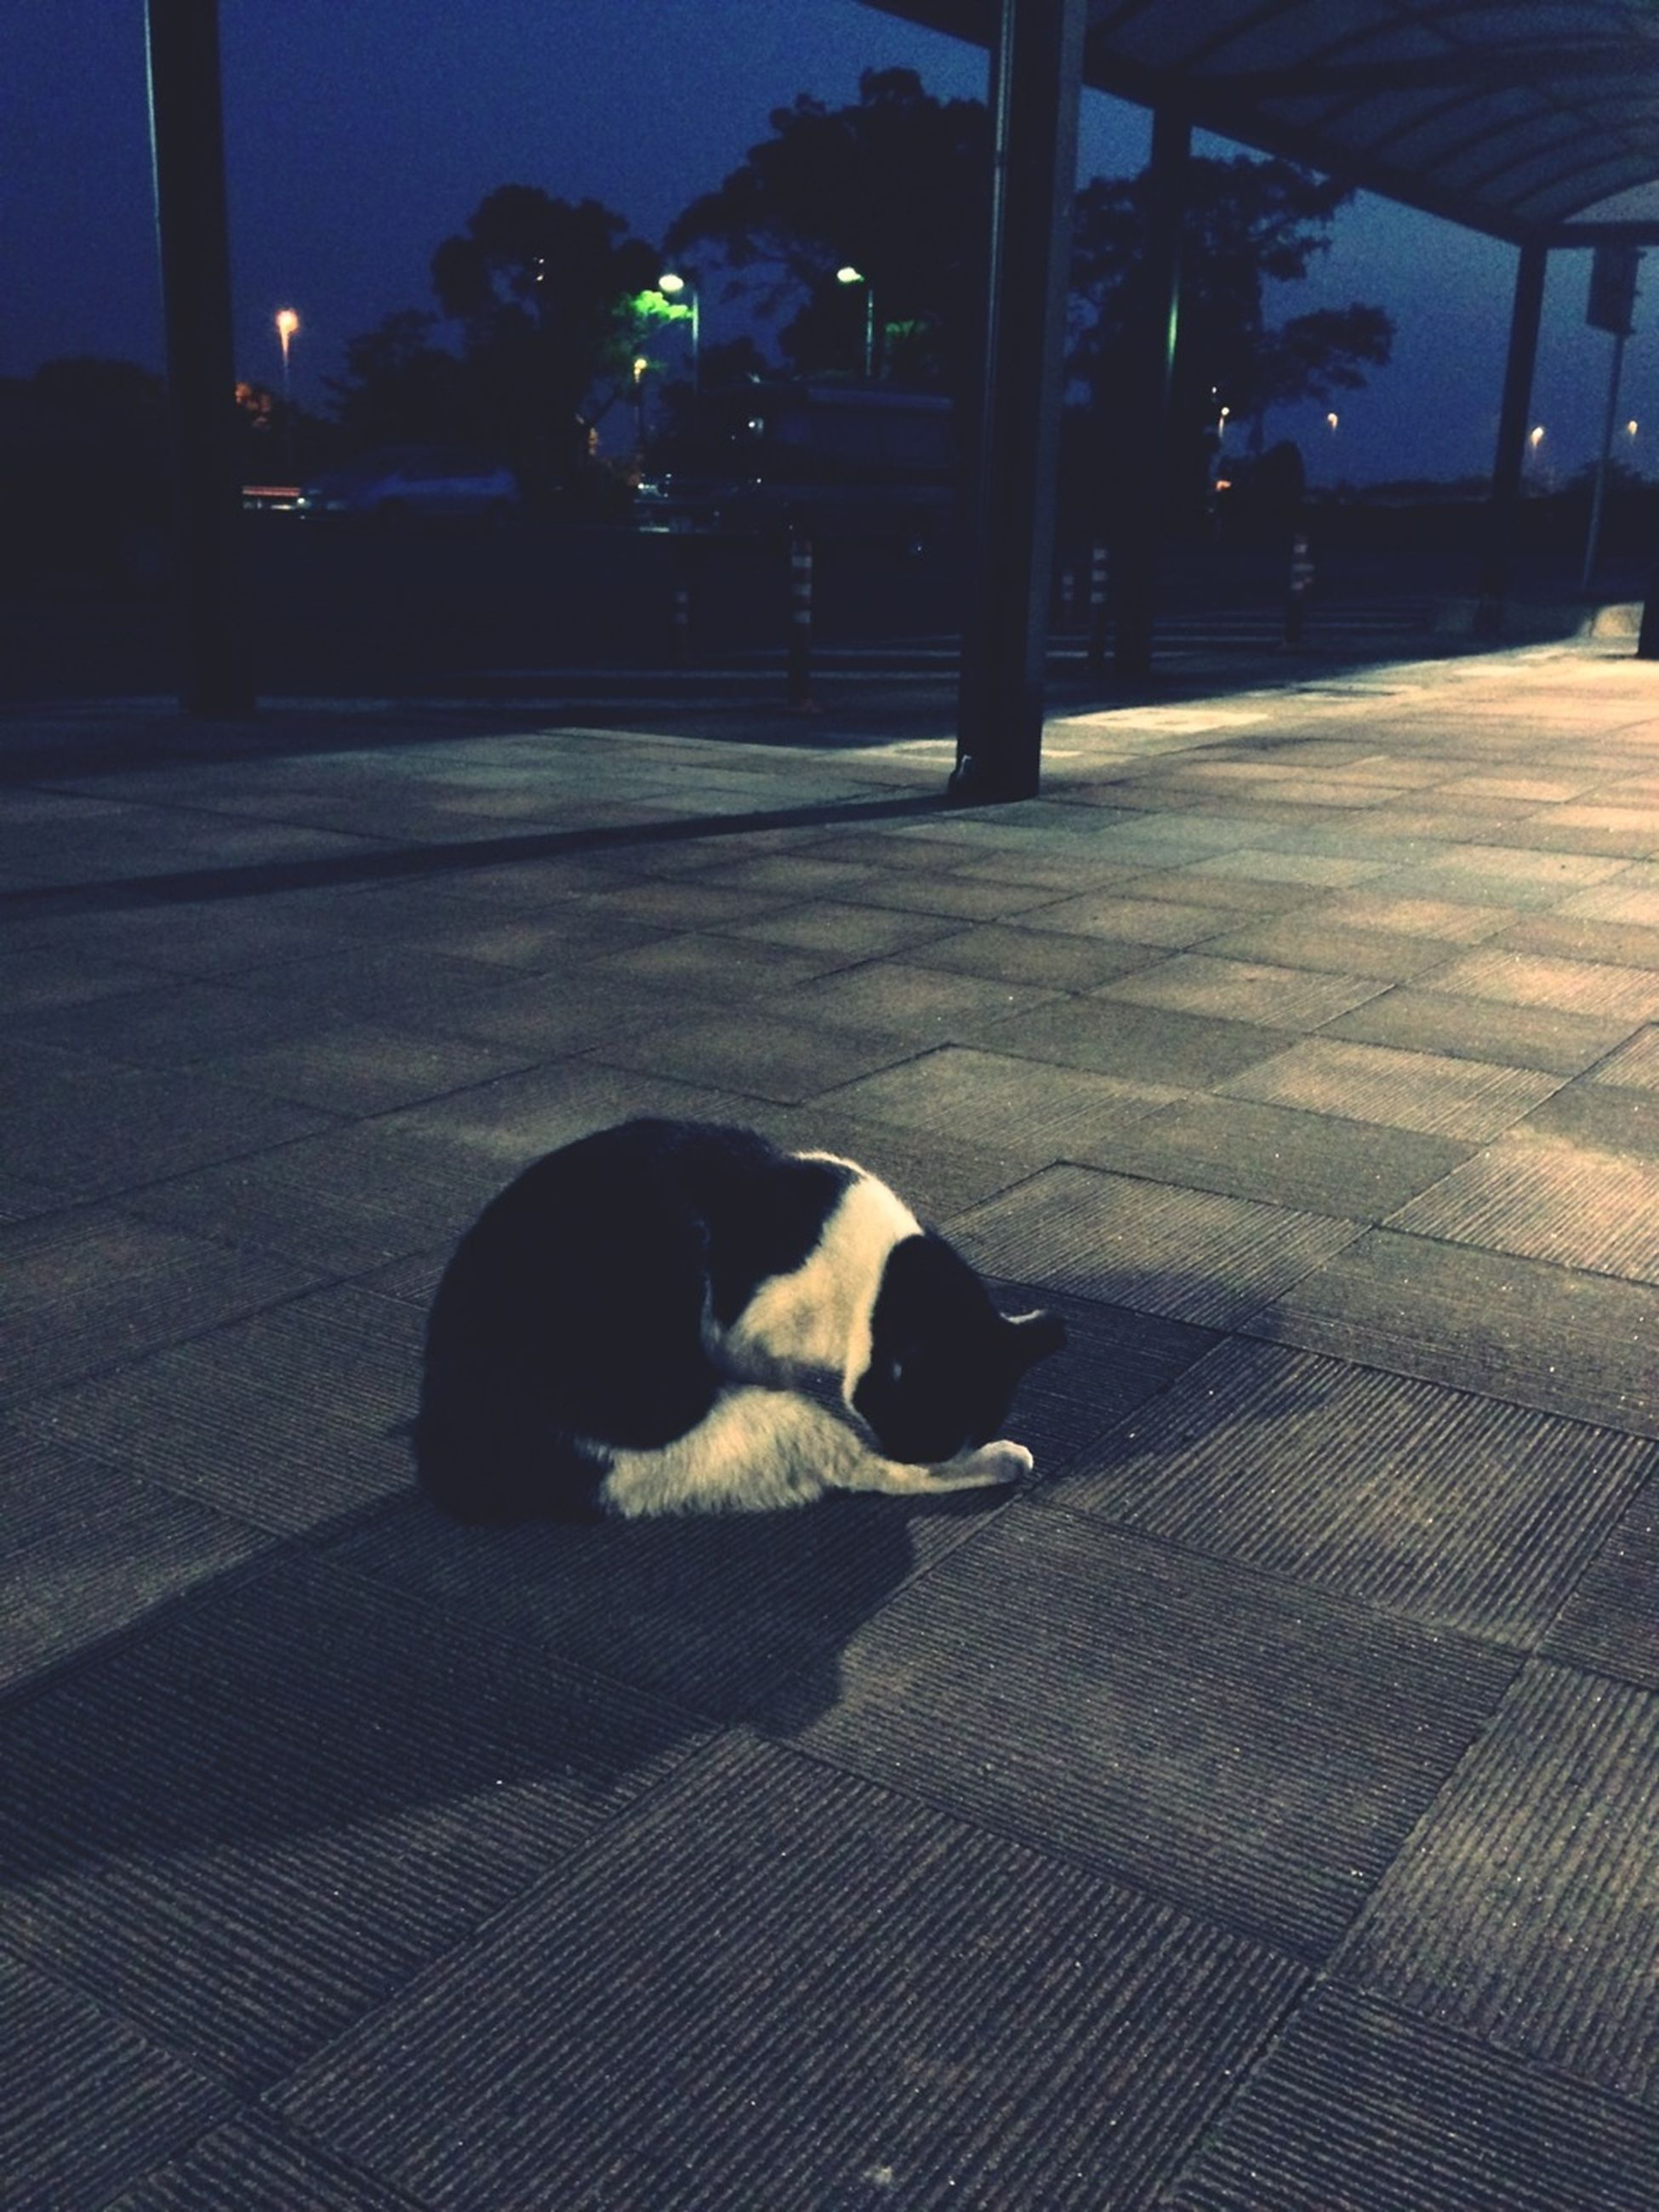 one animal, pets, animal themes, domestic animals, dog, mammal, street, night, shadow, sunlight, sitting, car, building exterior, road, domestic cat, full length, built structure, sidewalk, transportation, architecture